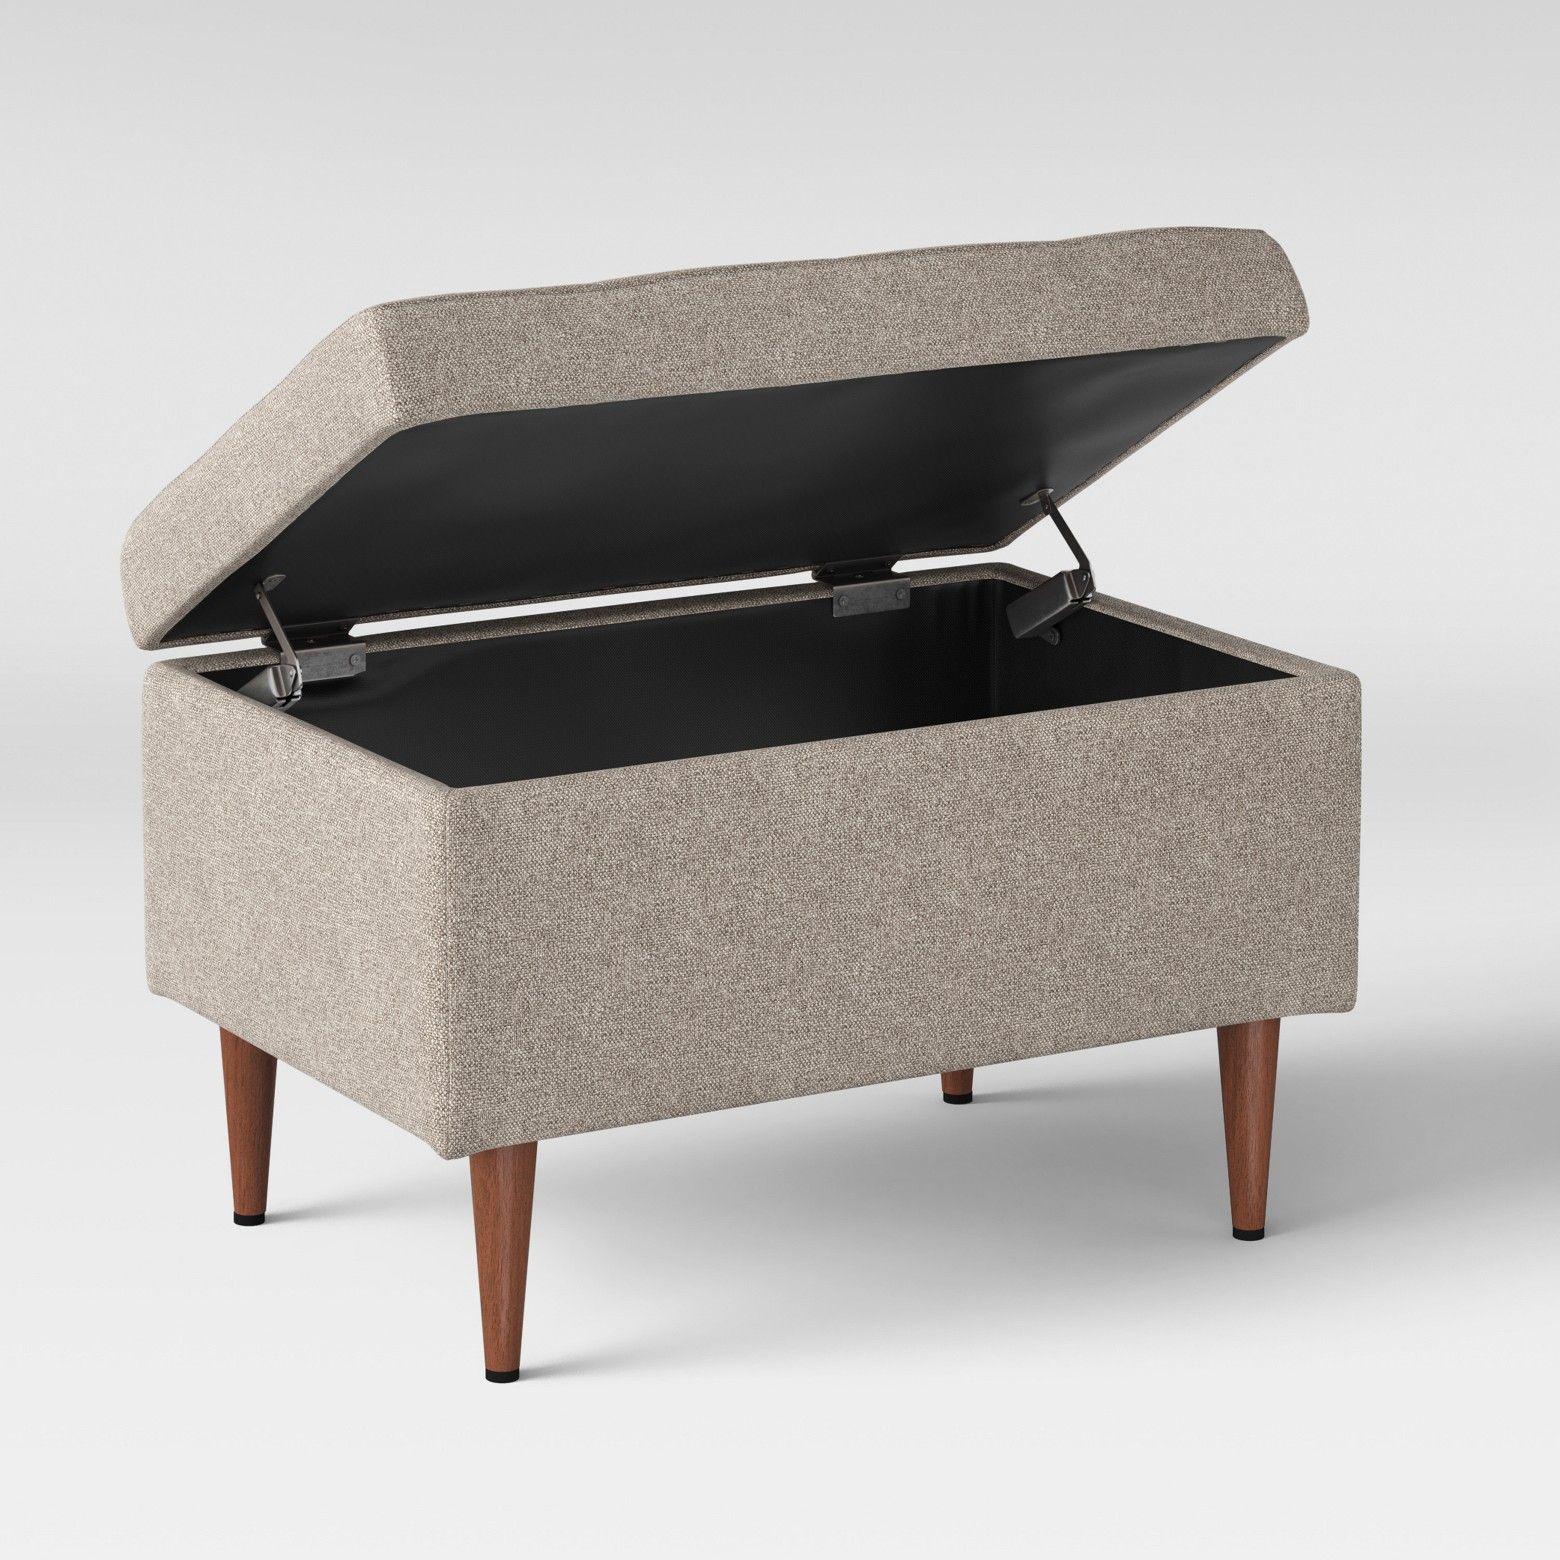 Sensational Lemoor Mid Century 28 Ottoman With Storage Gray Project Spiritservingveterans Wood Chair Design Ideas Spiritservingveteransorg